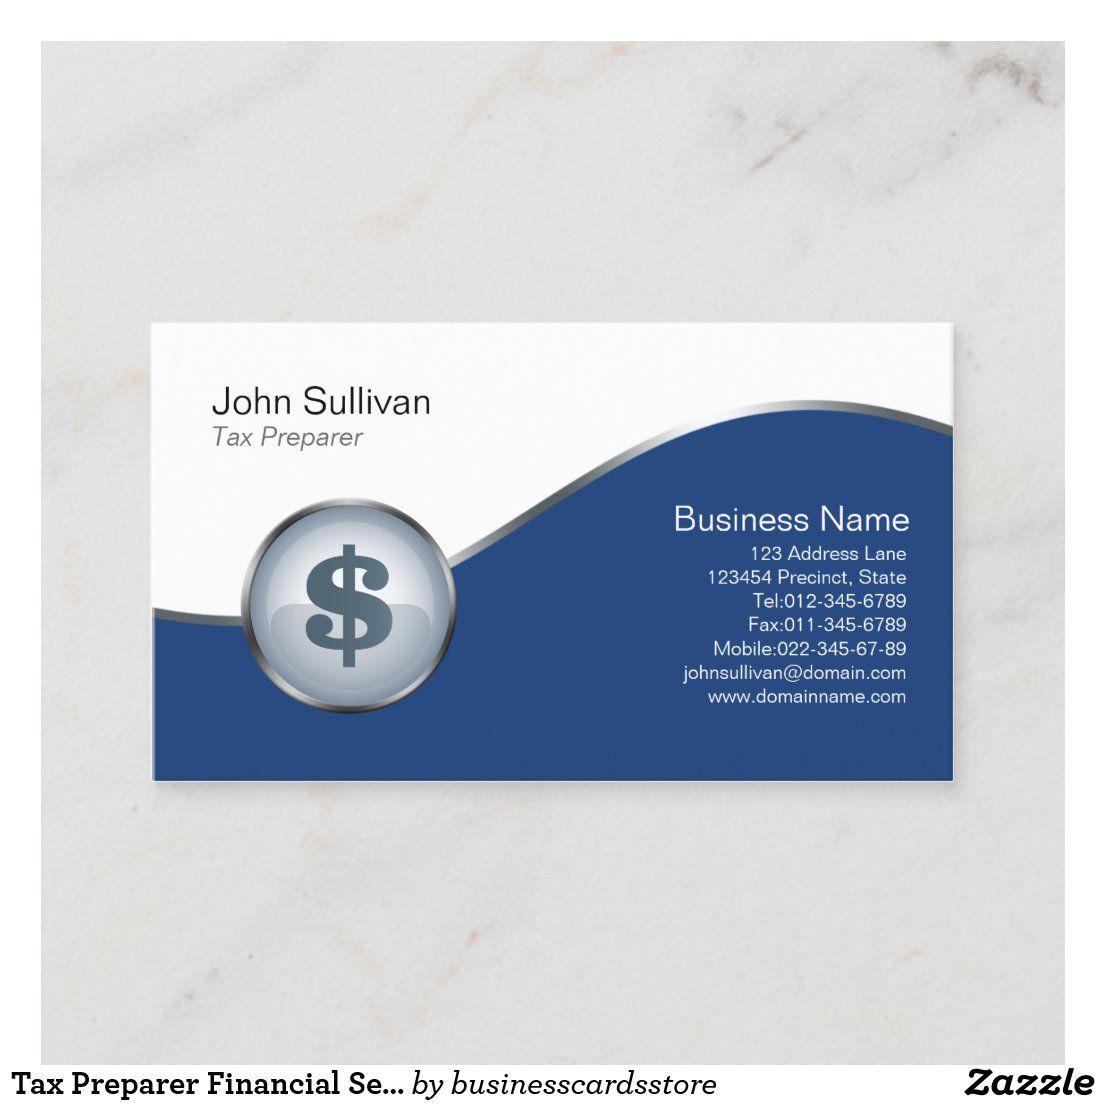 Tax Preparer Financial Services Dollar Icon Business Card Zazzle Com Business Marketing Design Social Media Advertising Design Advertising Design Business